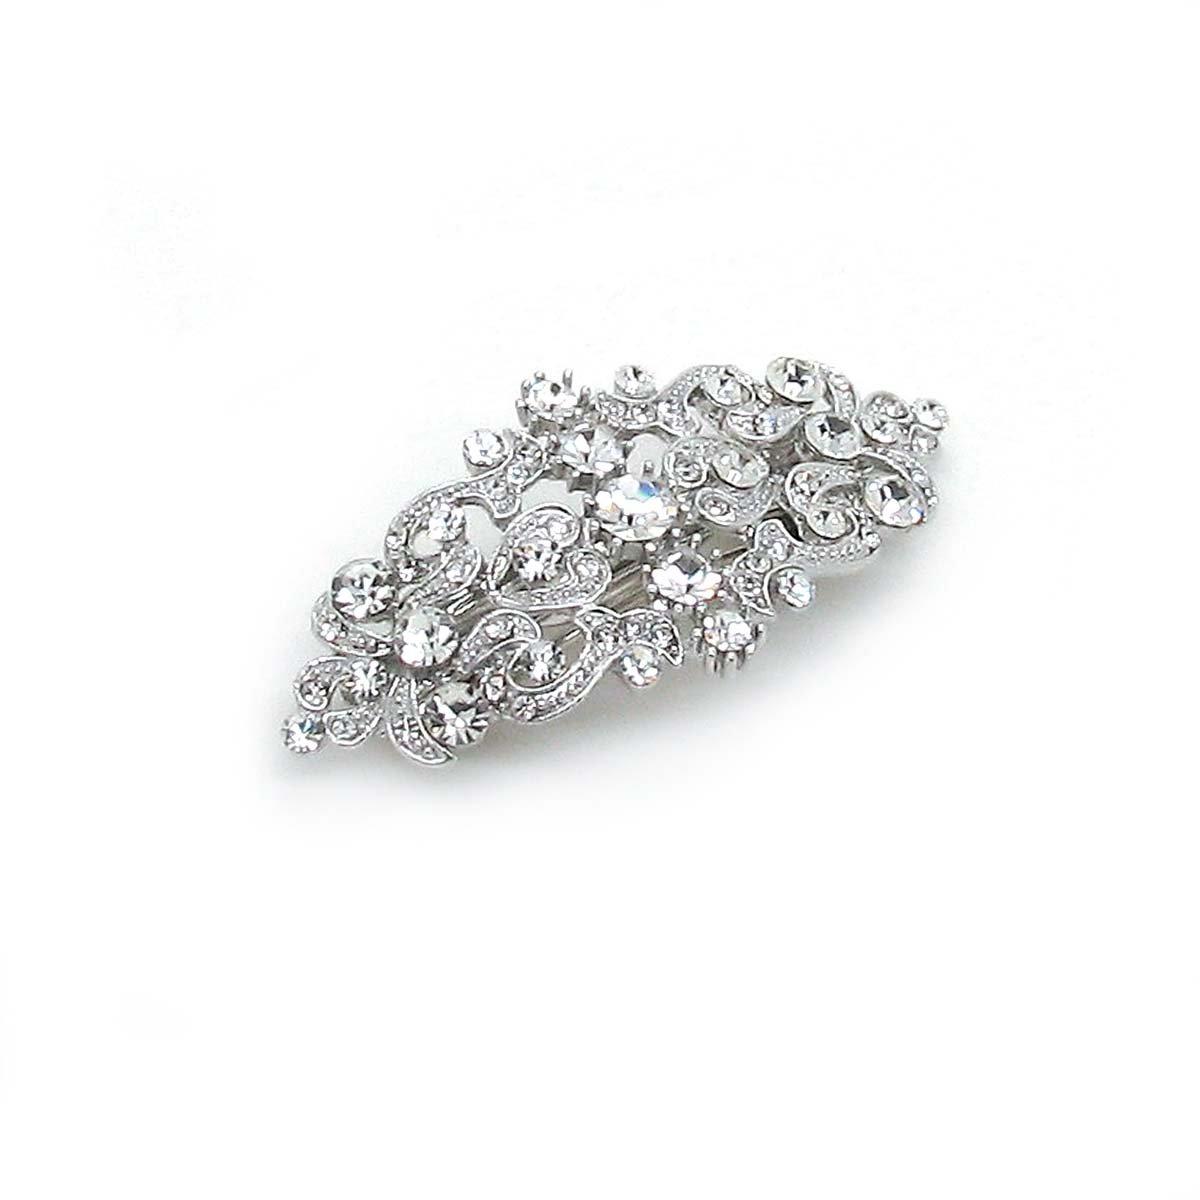 Sparkly Bride Bridal Hair Barrette Vintage Romancing Heart Rhinestone Crystal Small 2.5 inches